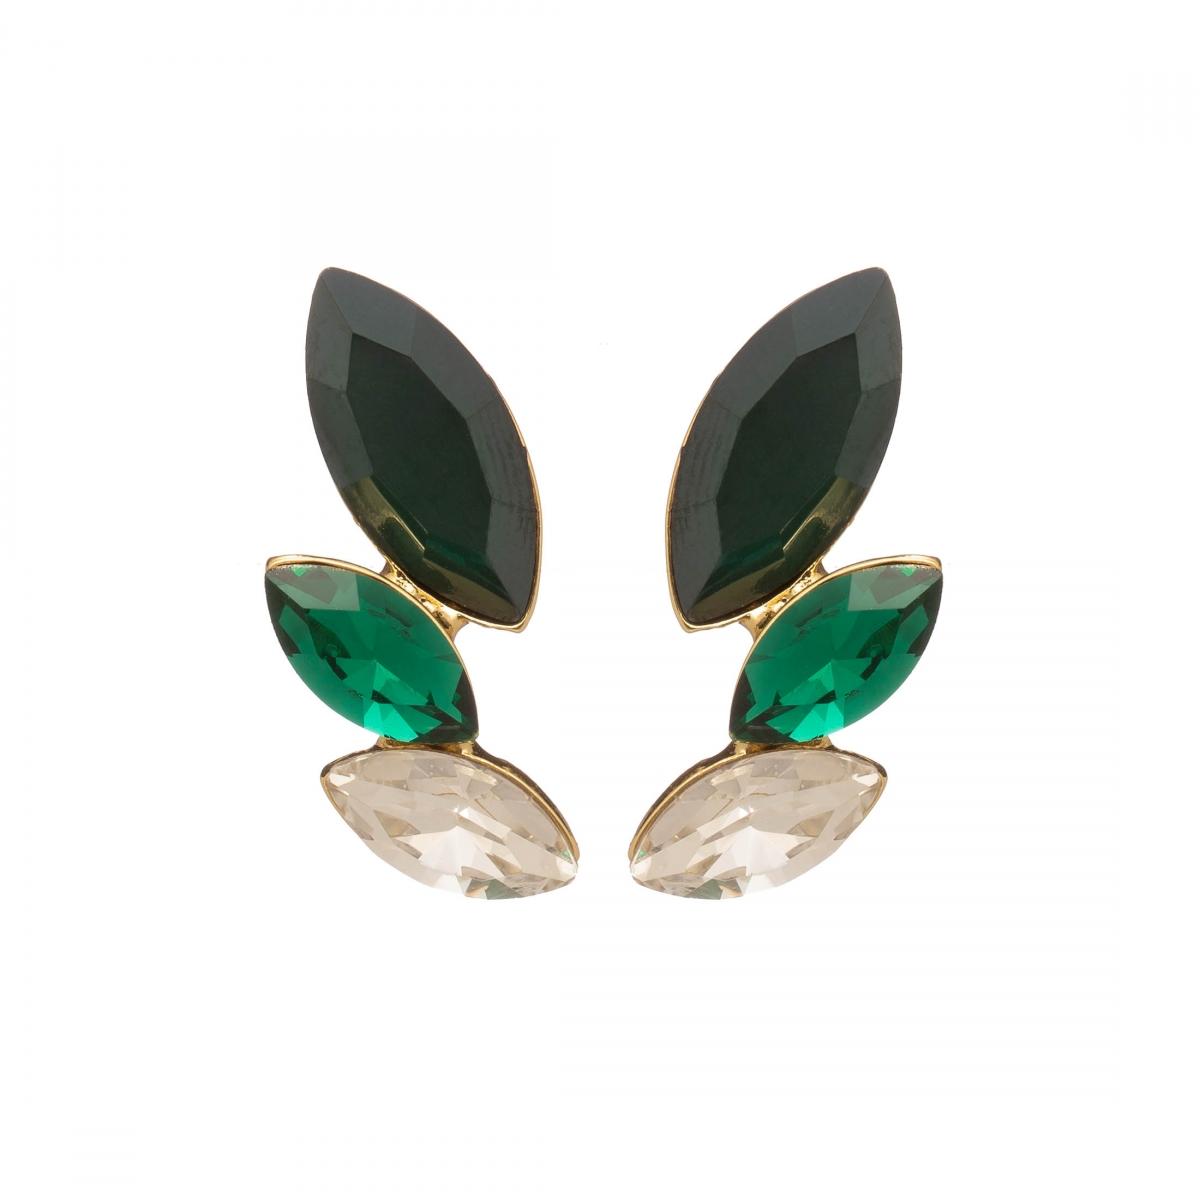 Náušnice Dita Exclusive Elegance Chic Modern Smaragd Green Crystals Gold